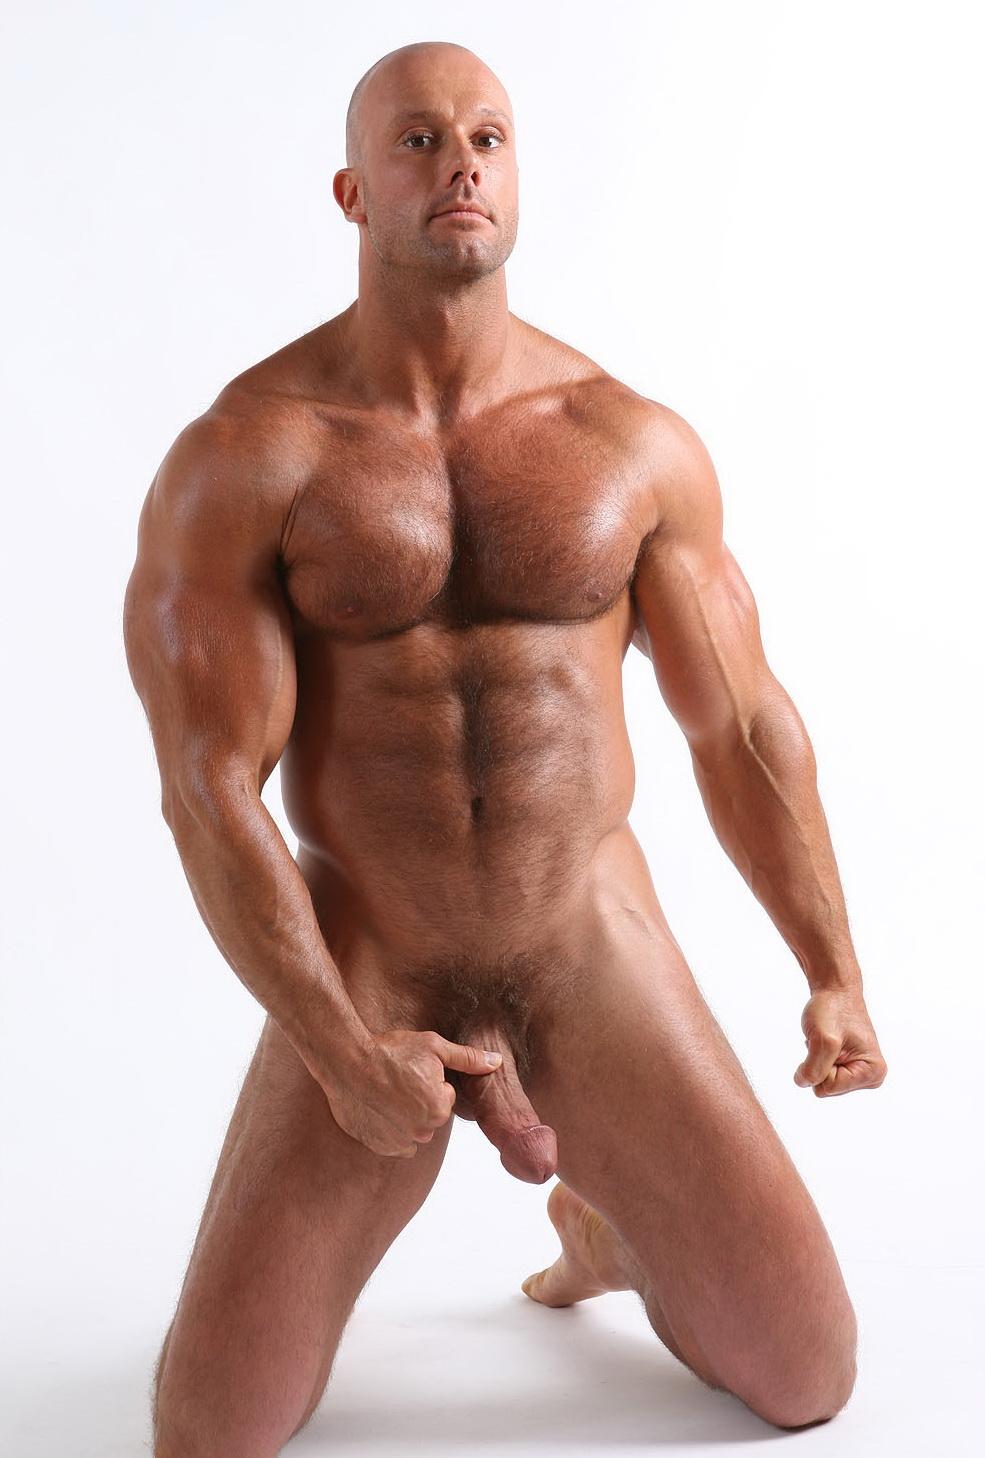 naked male legs spread